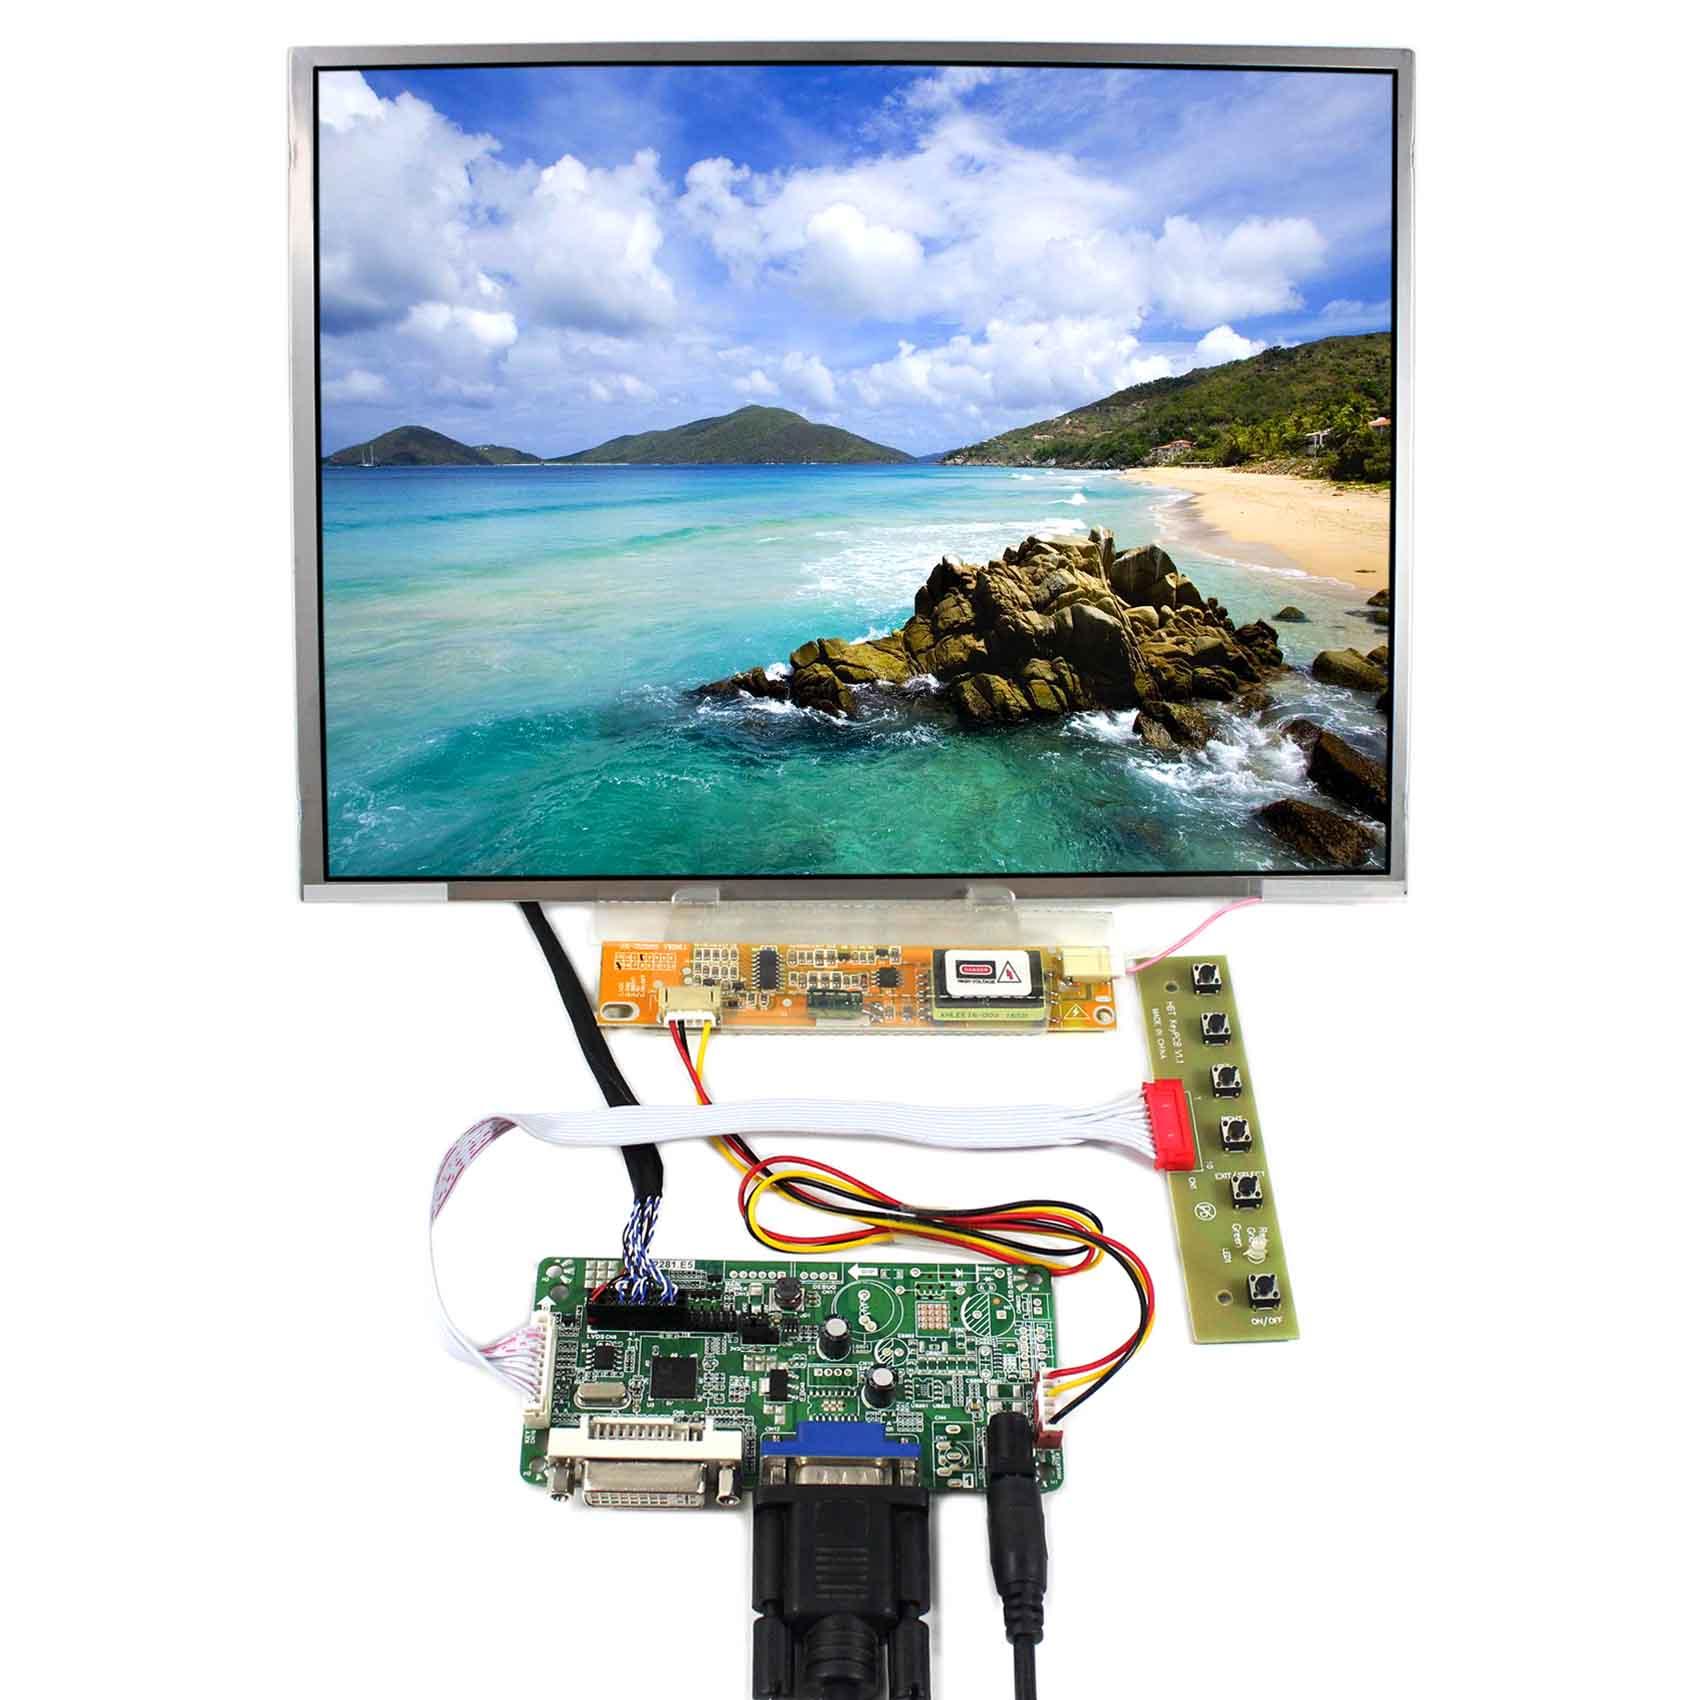 DVI+VGA LCD Controller Board With 12.1inch LTN121XT HT121X01 N121X5 1024x768 LCD ScreenDVI+VGA LCD Controller Board With 12.1inch LTN121XT HT121X01 N121X5 1024x768 LCD Screen